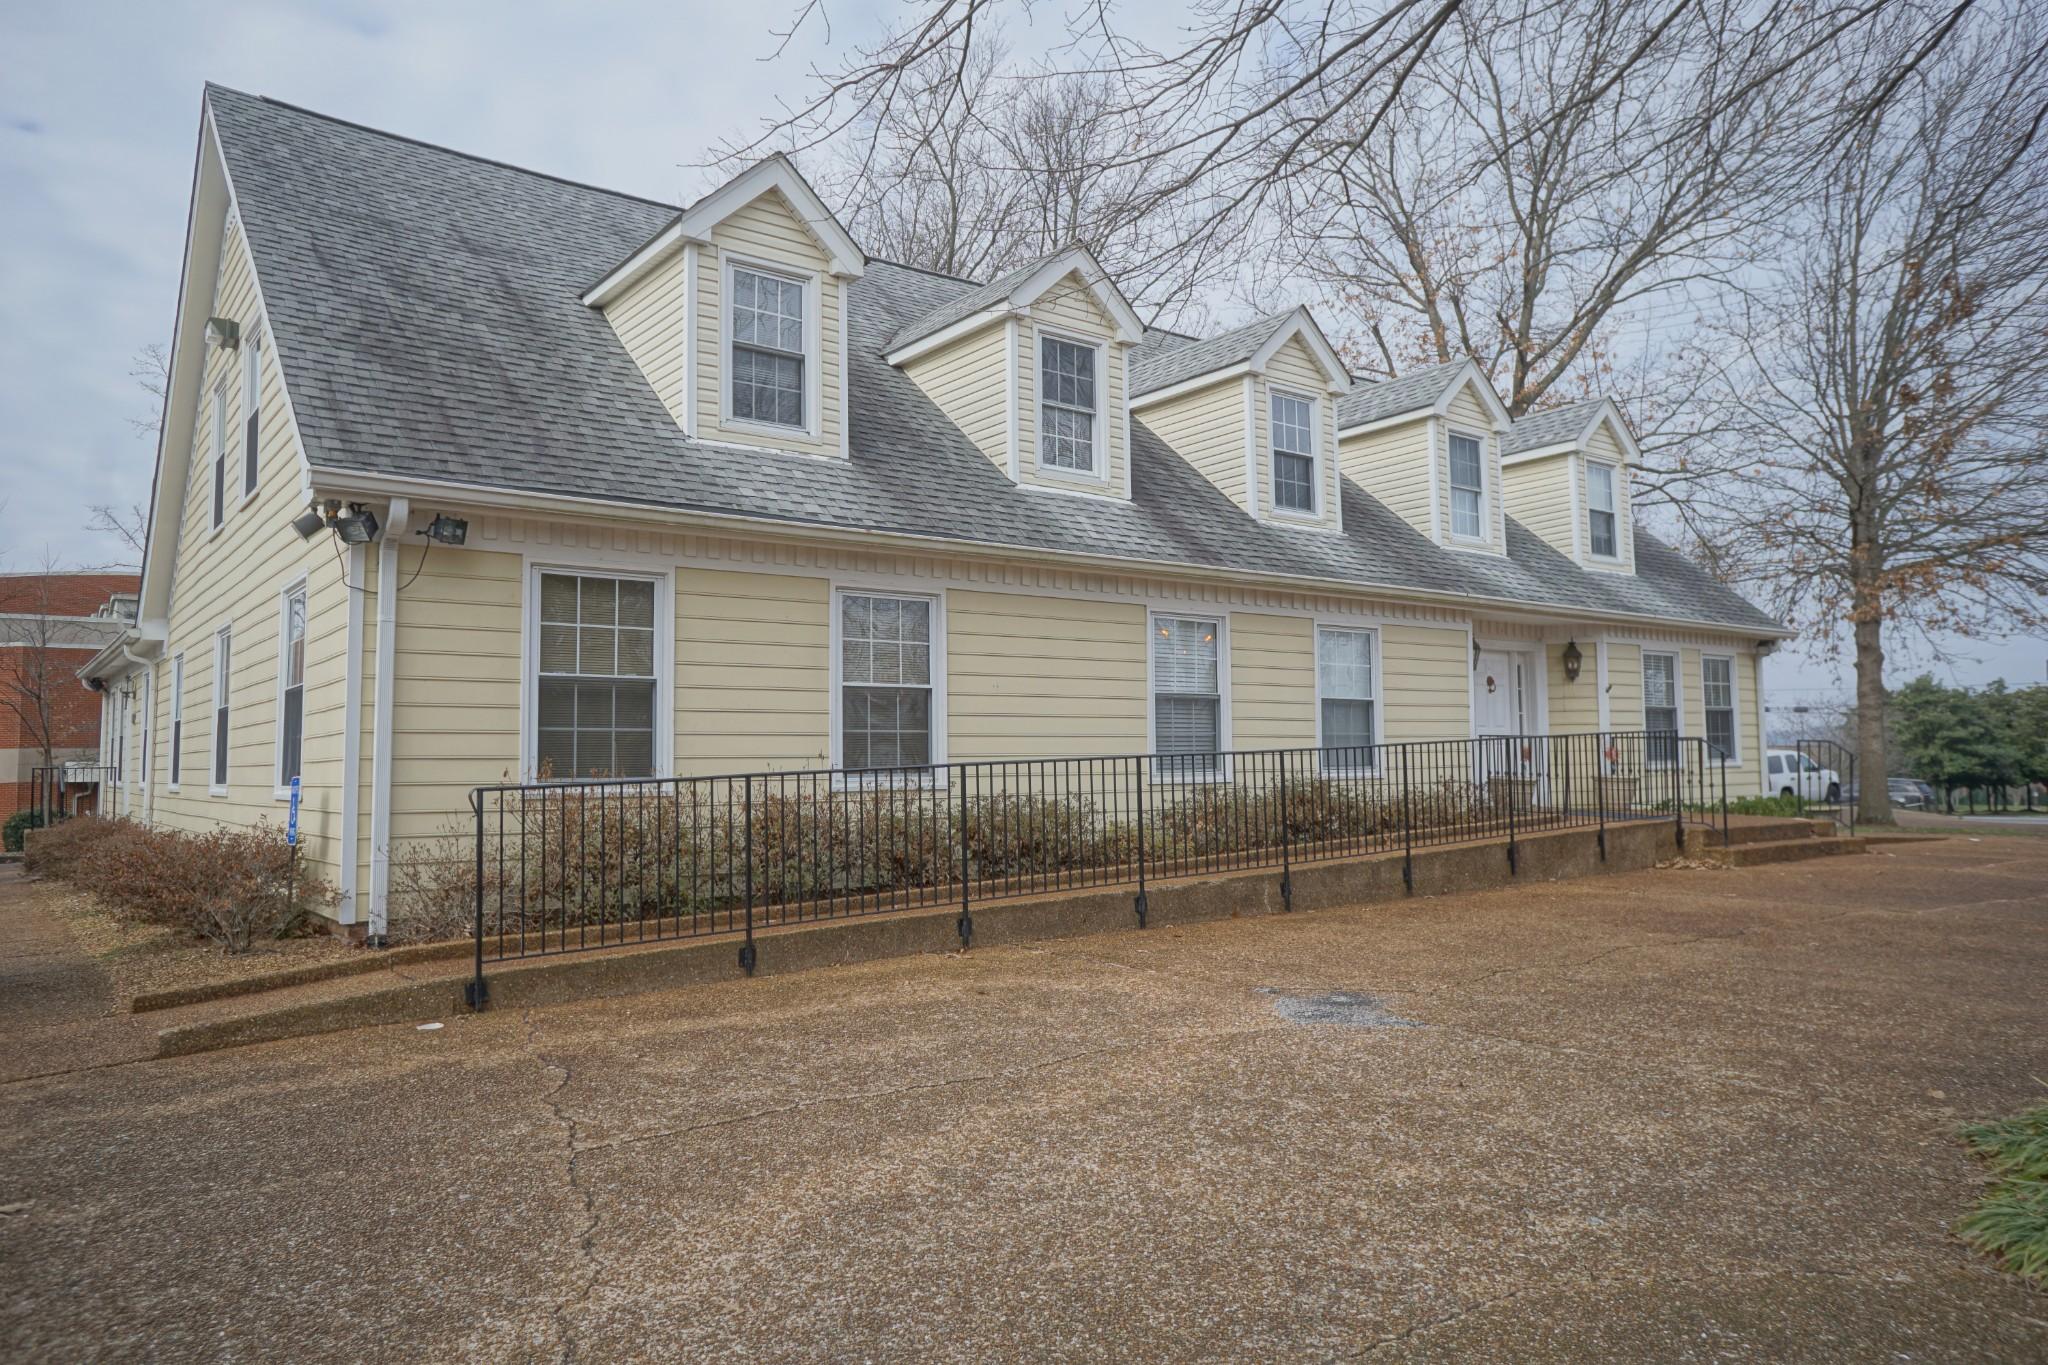 333 E Main St Property Photo - Hendersonville, TN real estate listing